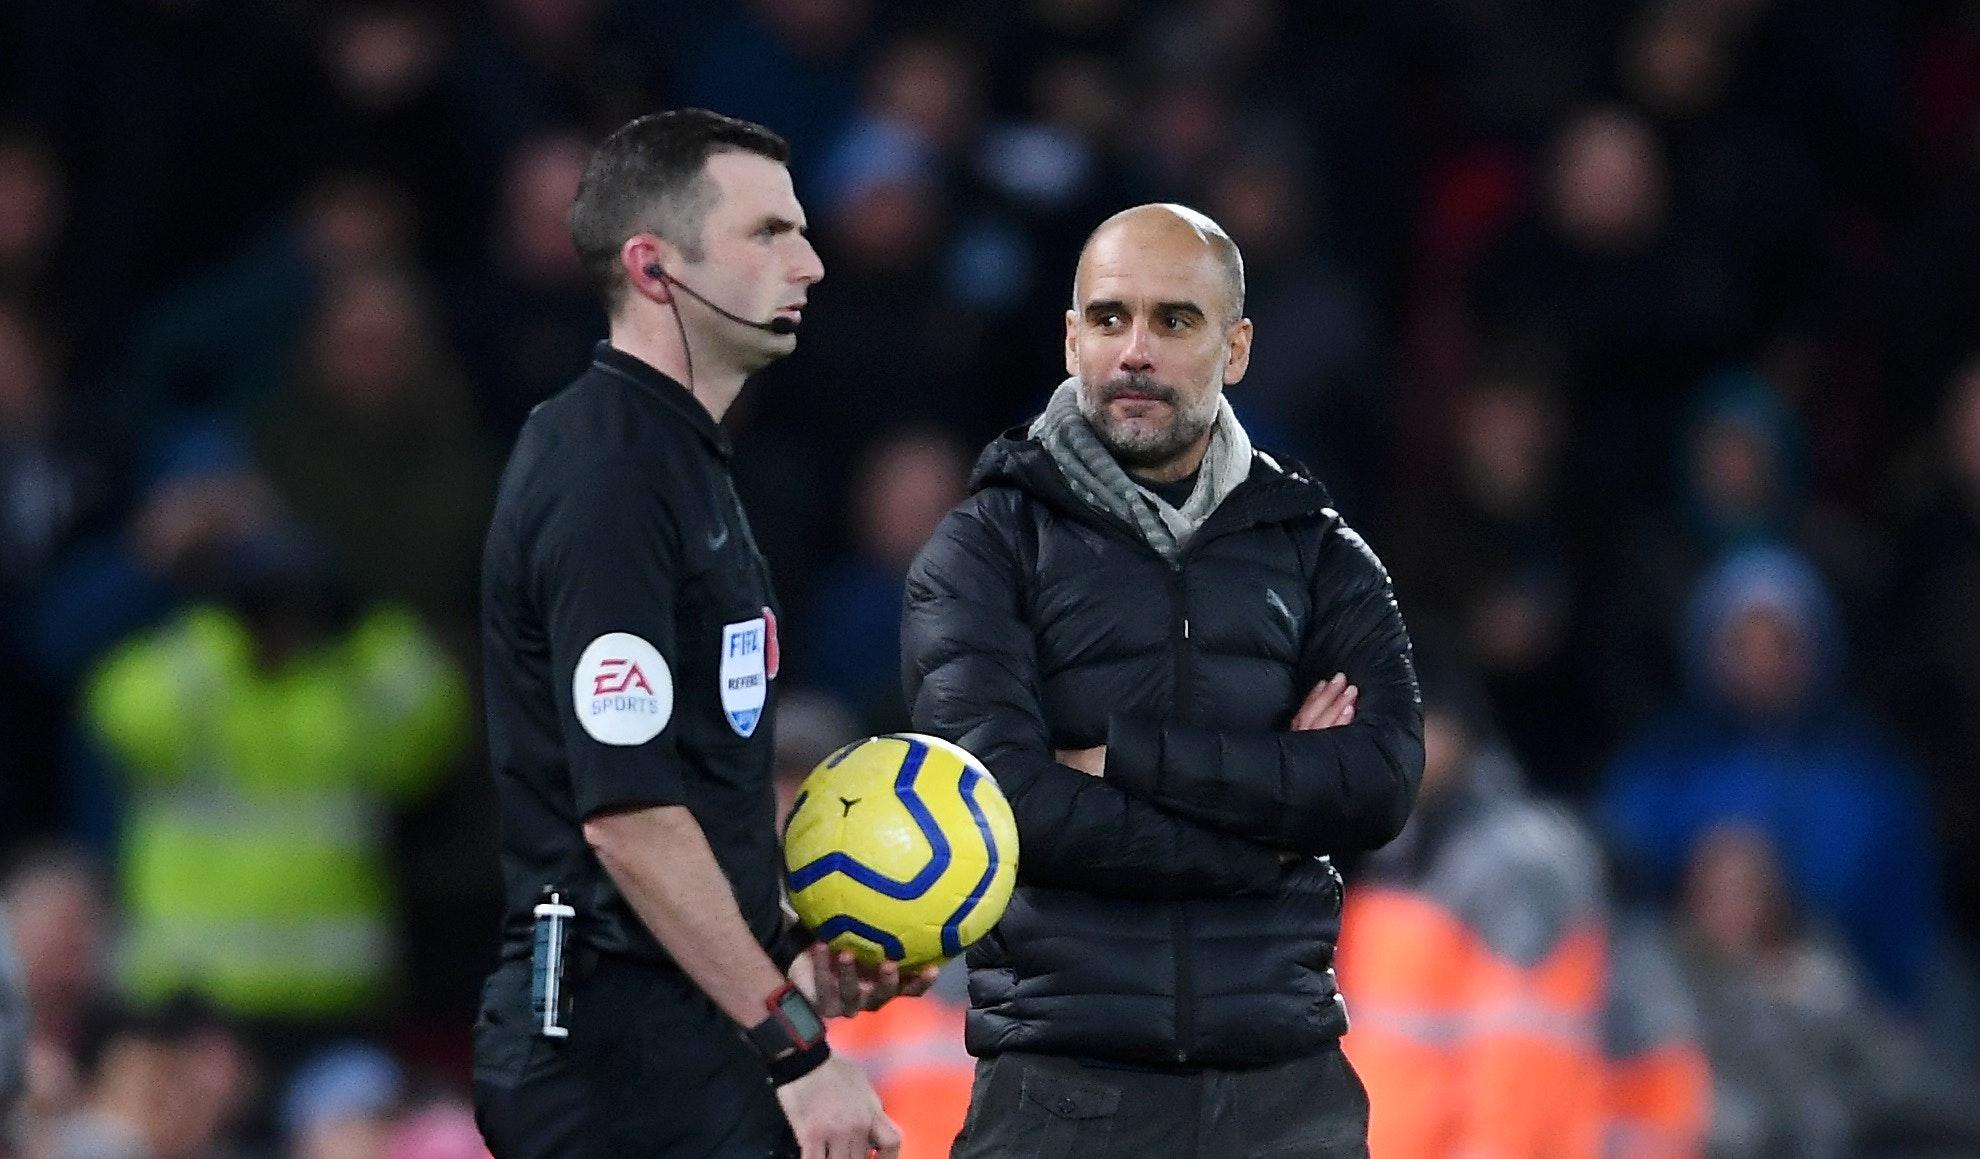 Manchester City med formell klage på dommer Michael Oliver etter tapet på Anfield